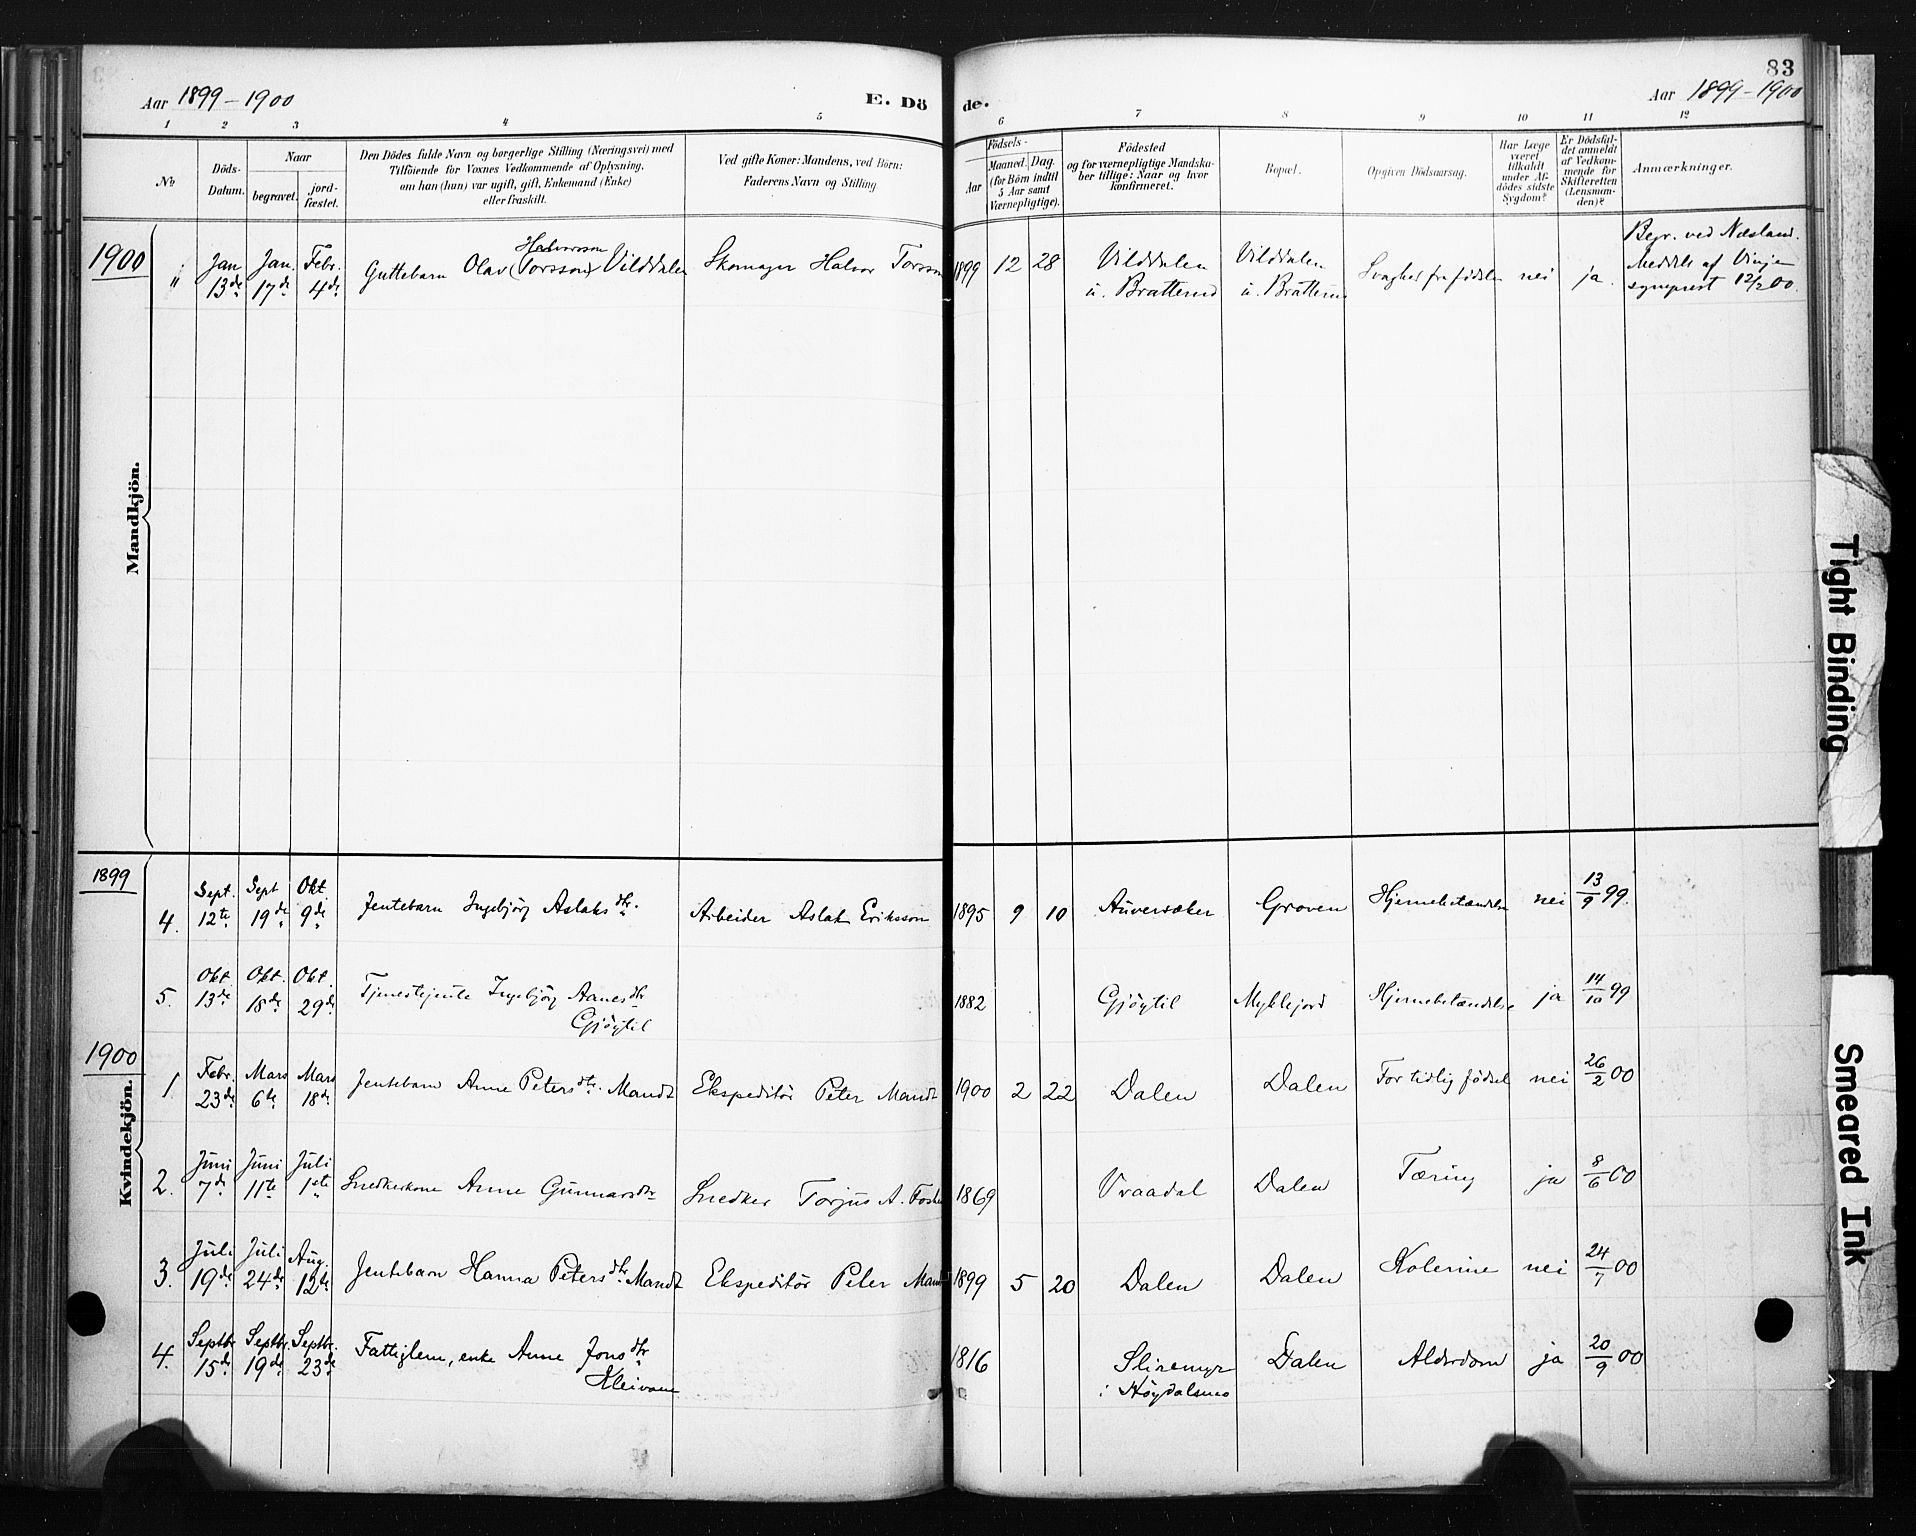 SAKO, Lårdal kirkebøker, F/Fb/L0002: Ministerialbok nr. II 2, 1887-1918, s. 83